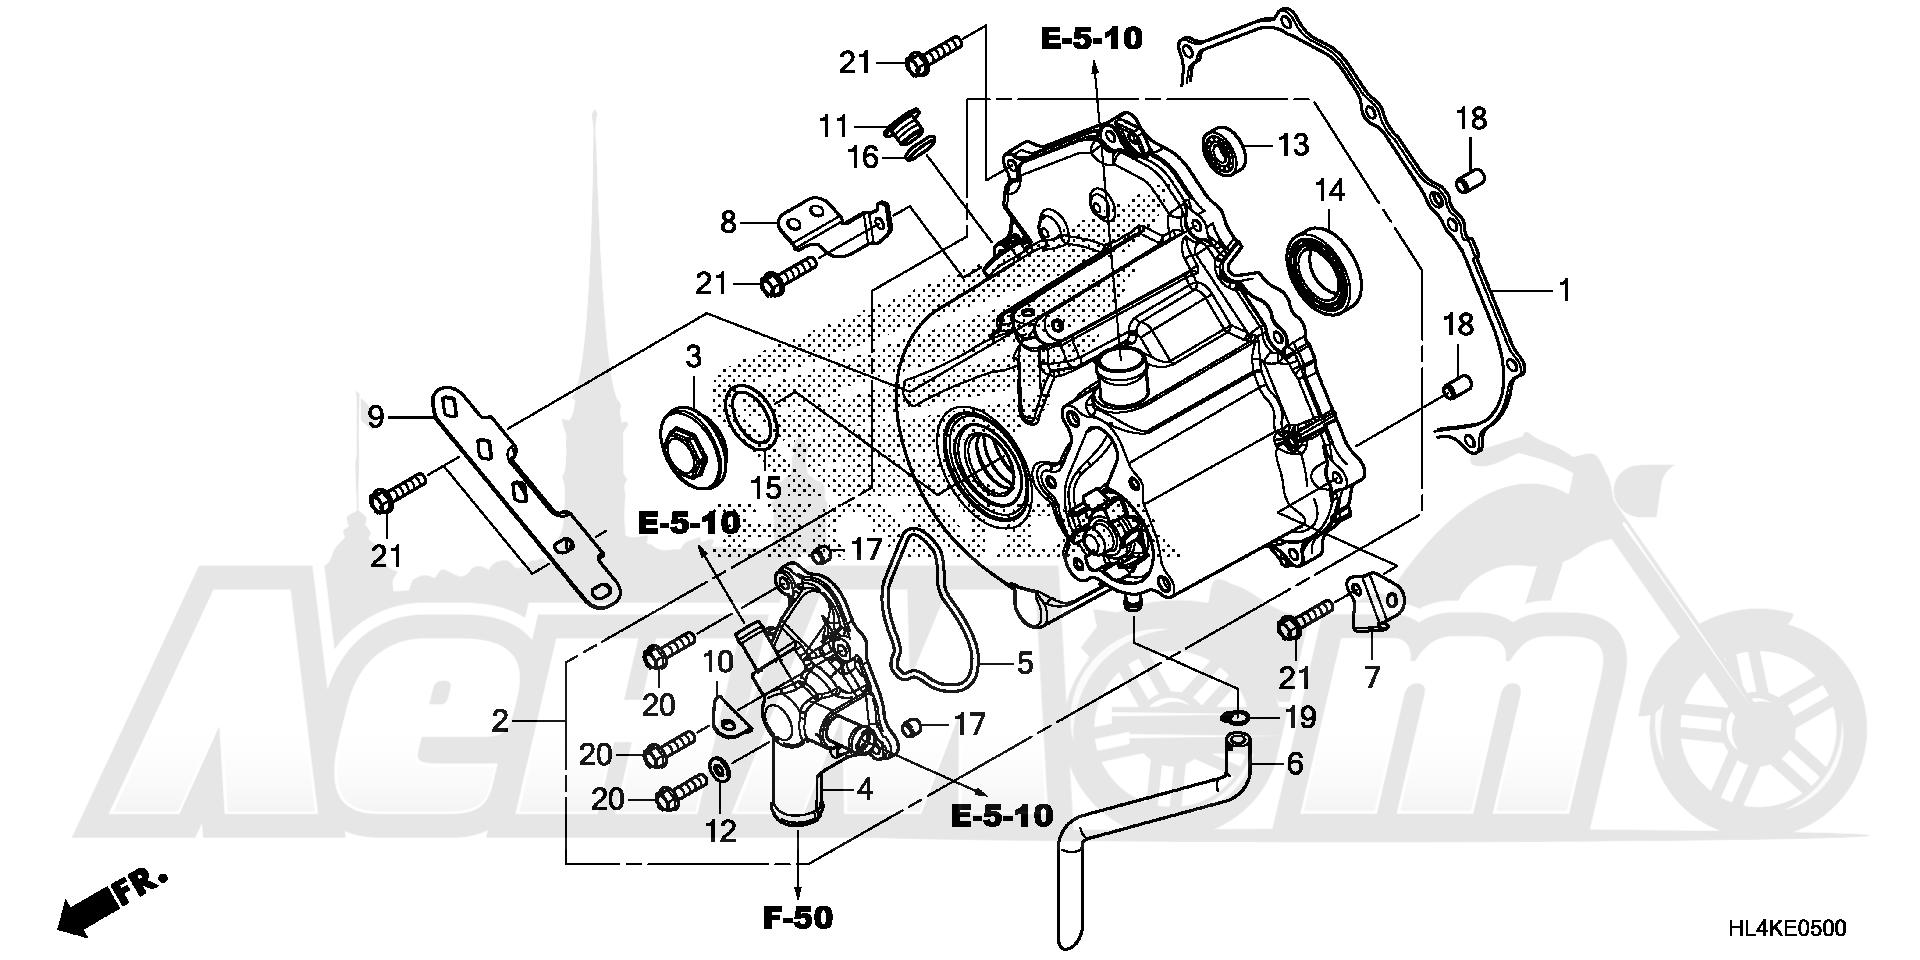 Запчасти для Квадроцикла Honda 2019 SXS1000M5P Раздел: ALTERNATOR COVER | генератор крышка